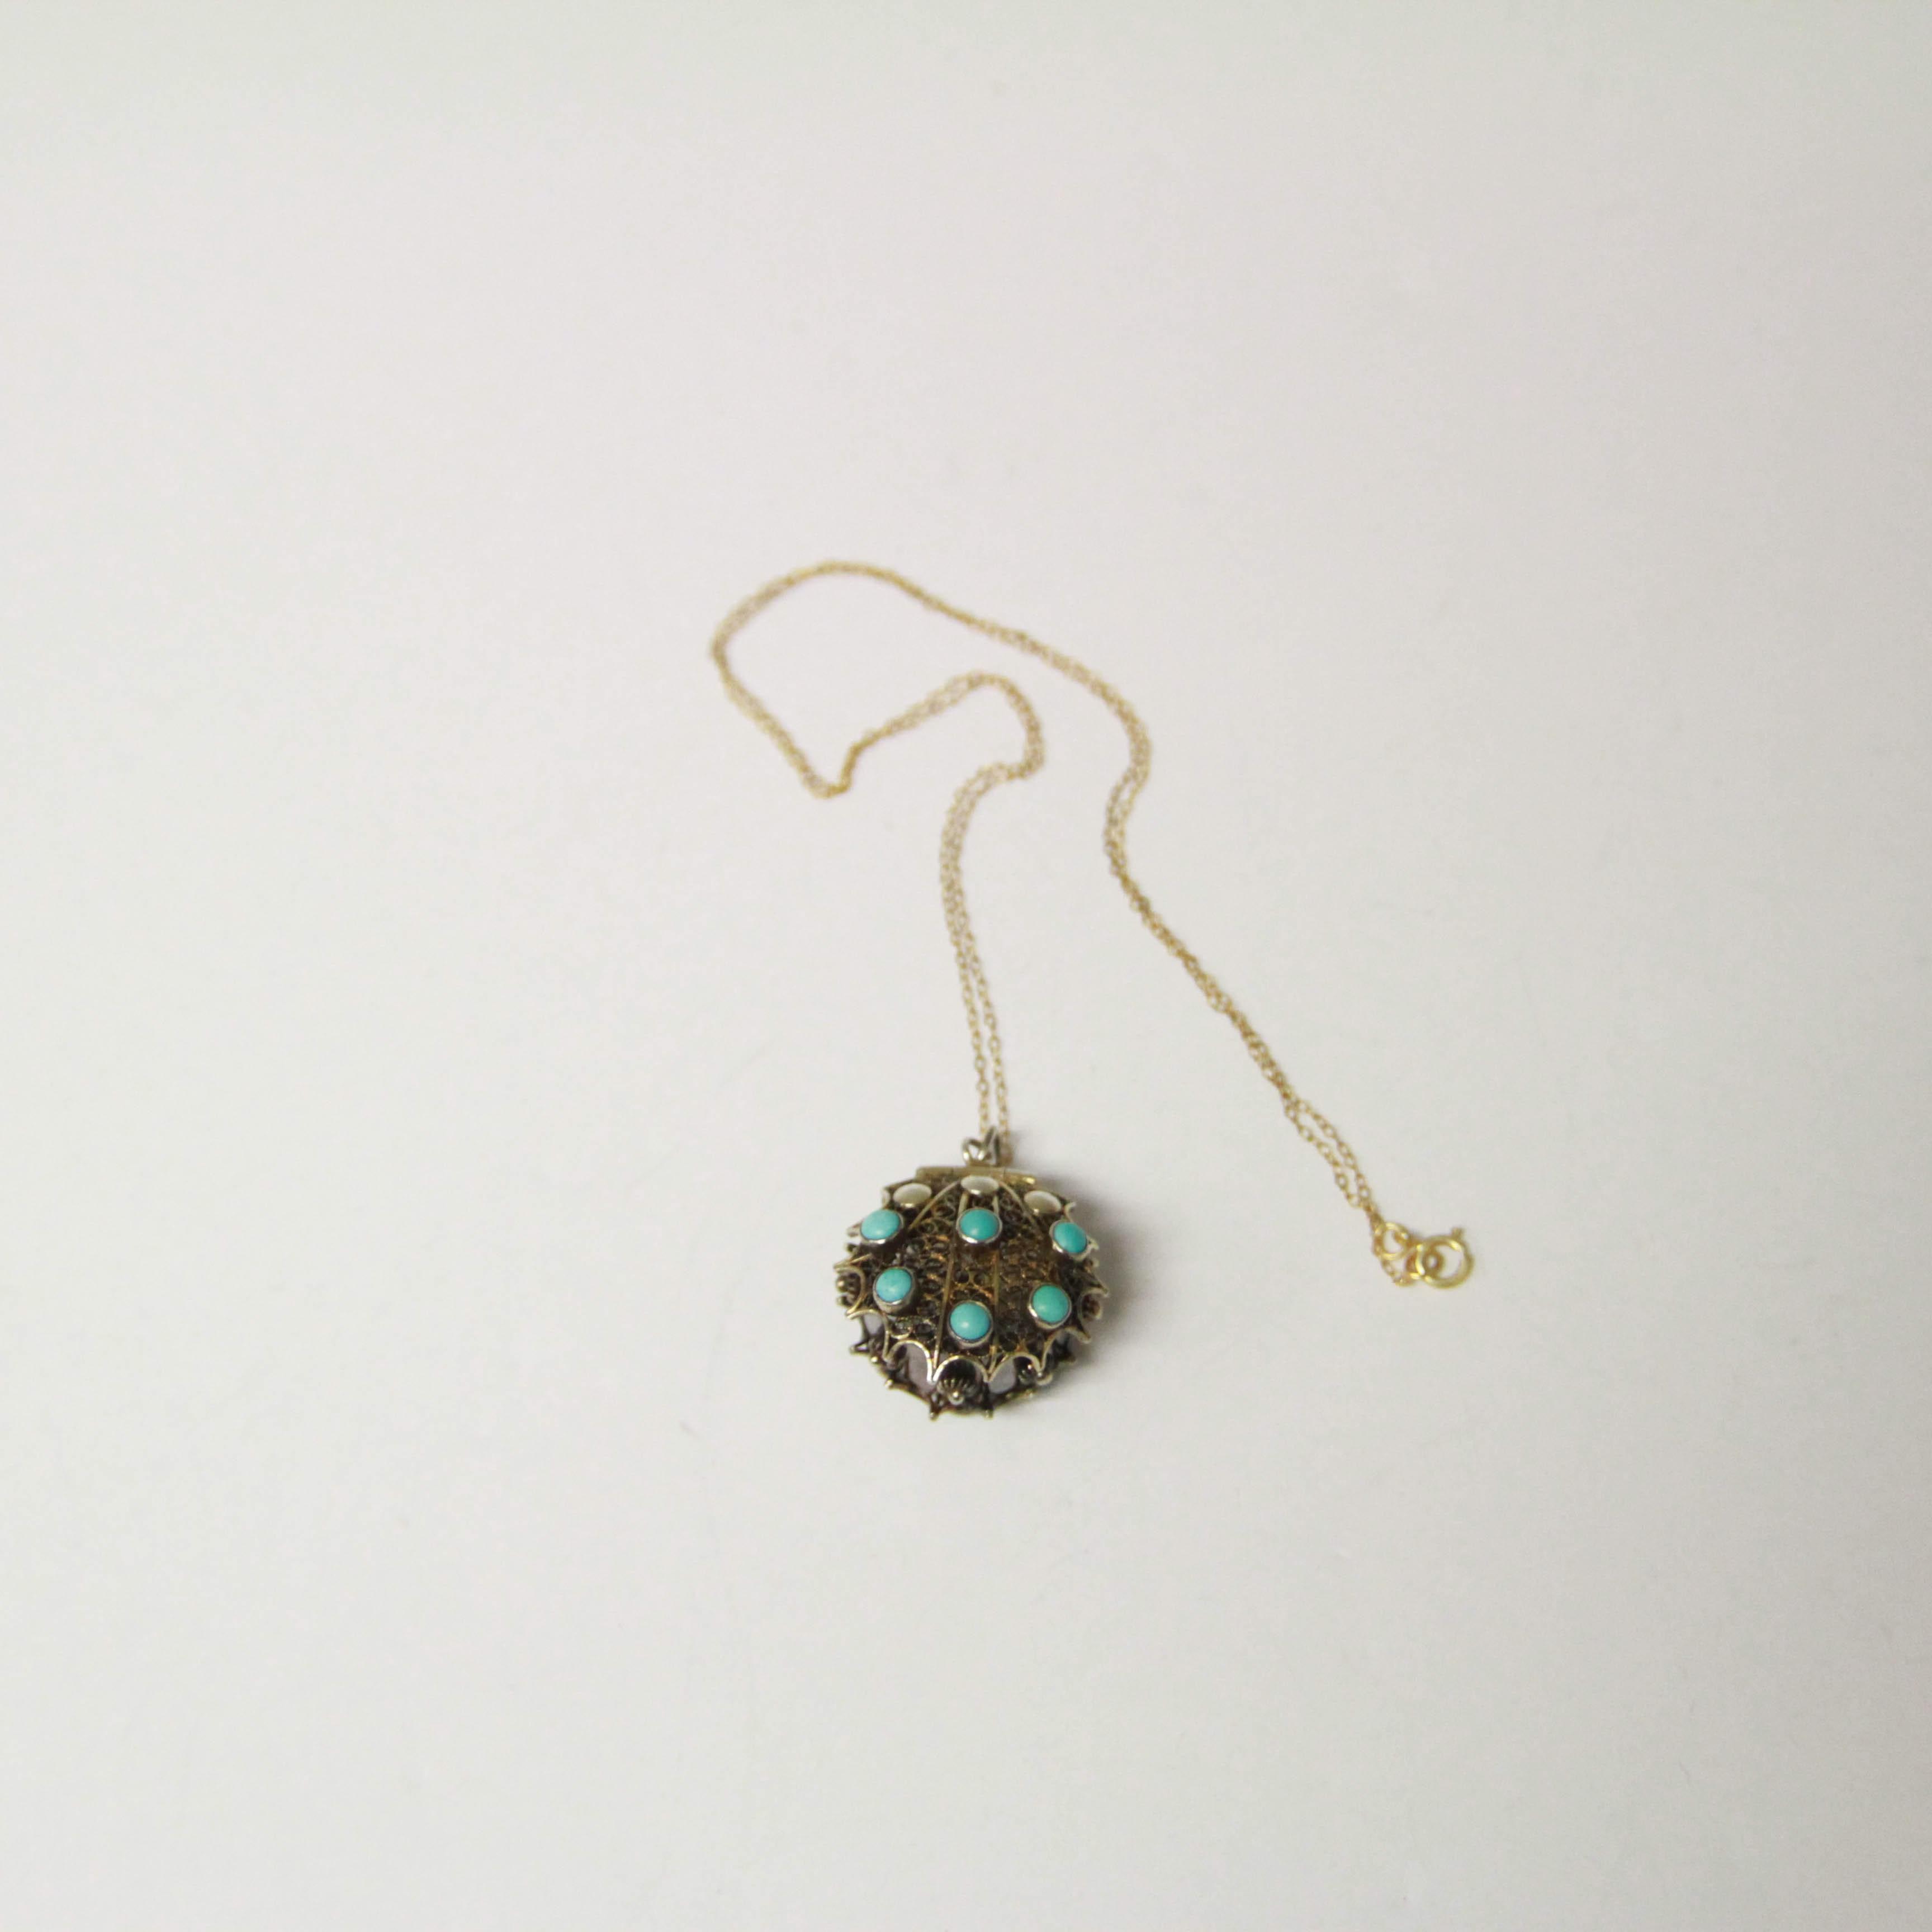 Vintage Vermeil Sterling Silver Turquoise Purse Locket Necklace